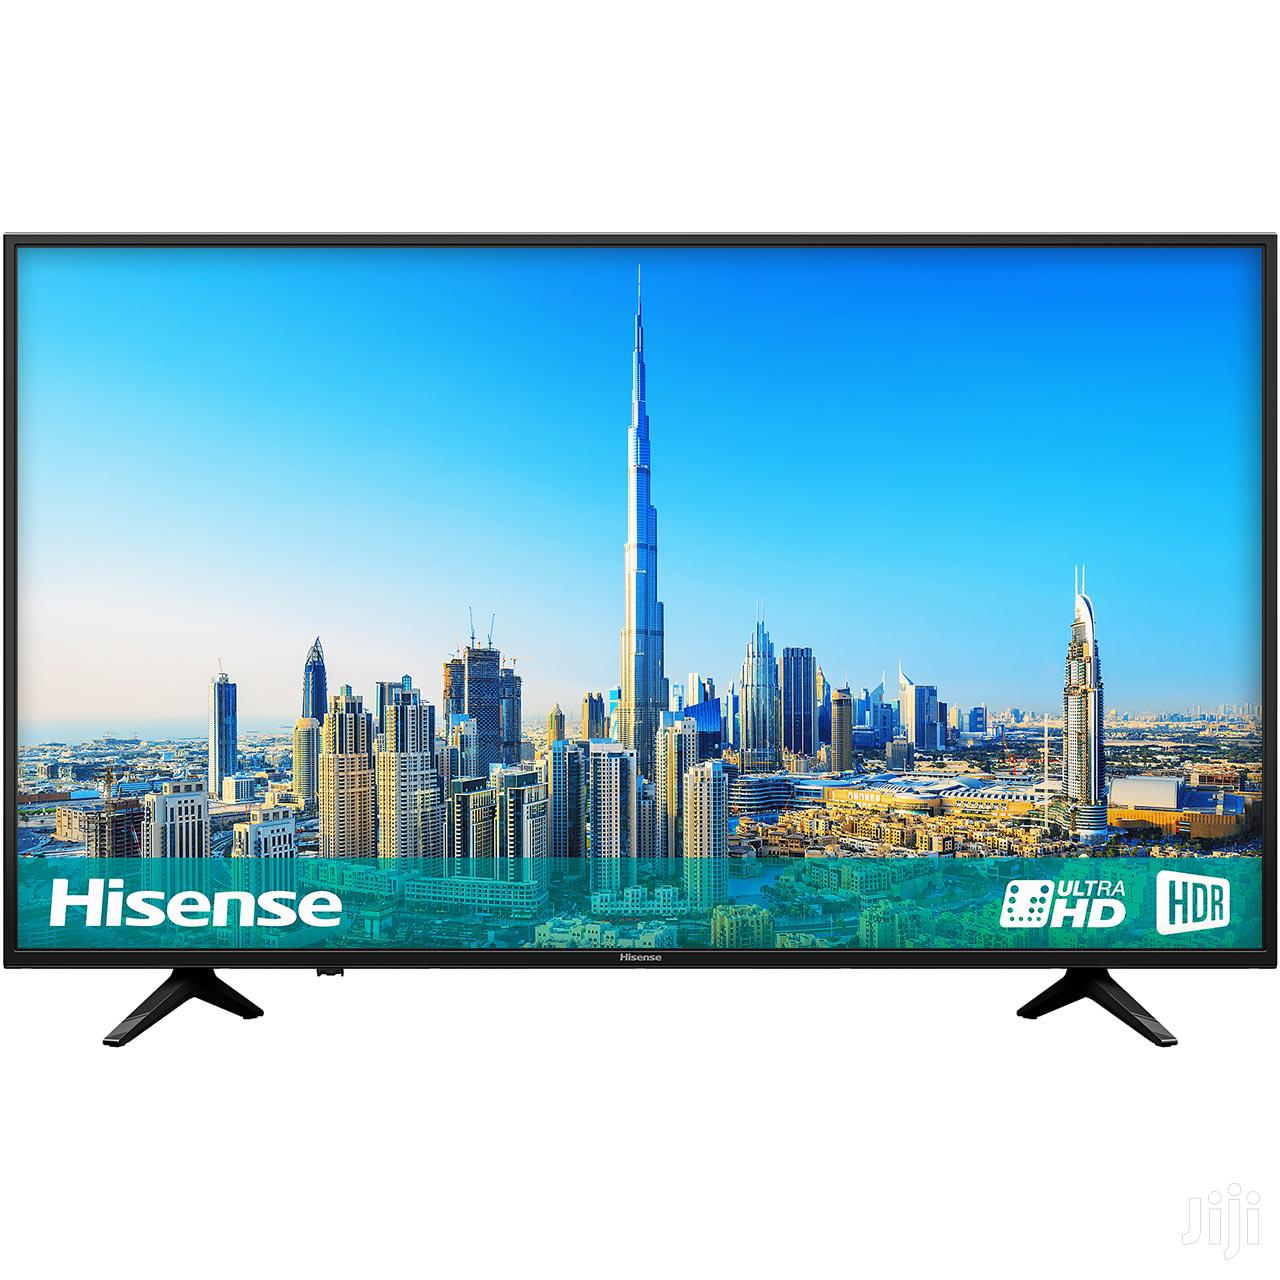 Hisense 24 Inches LED Tv24